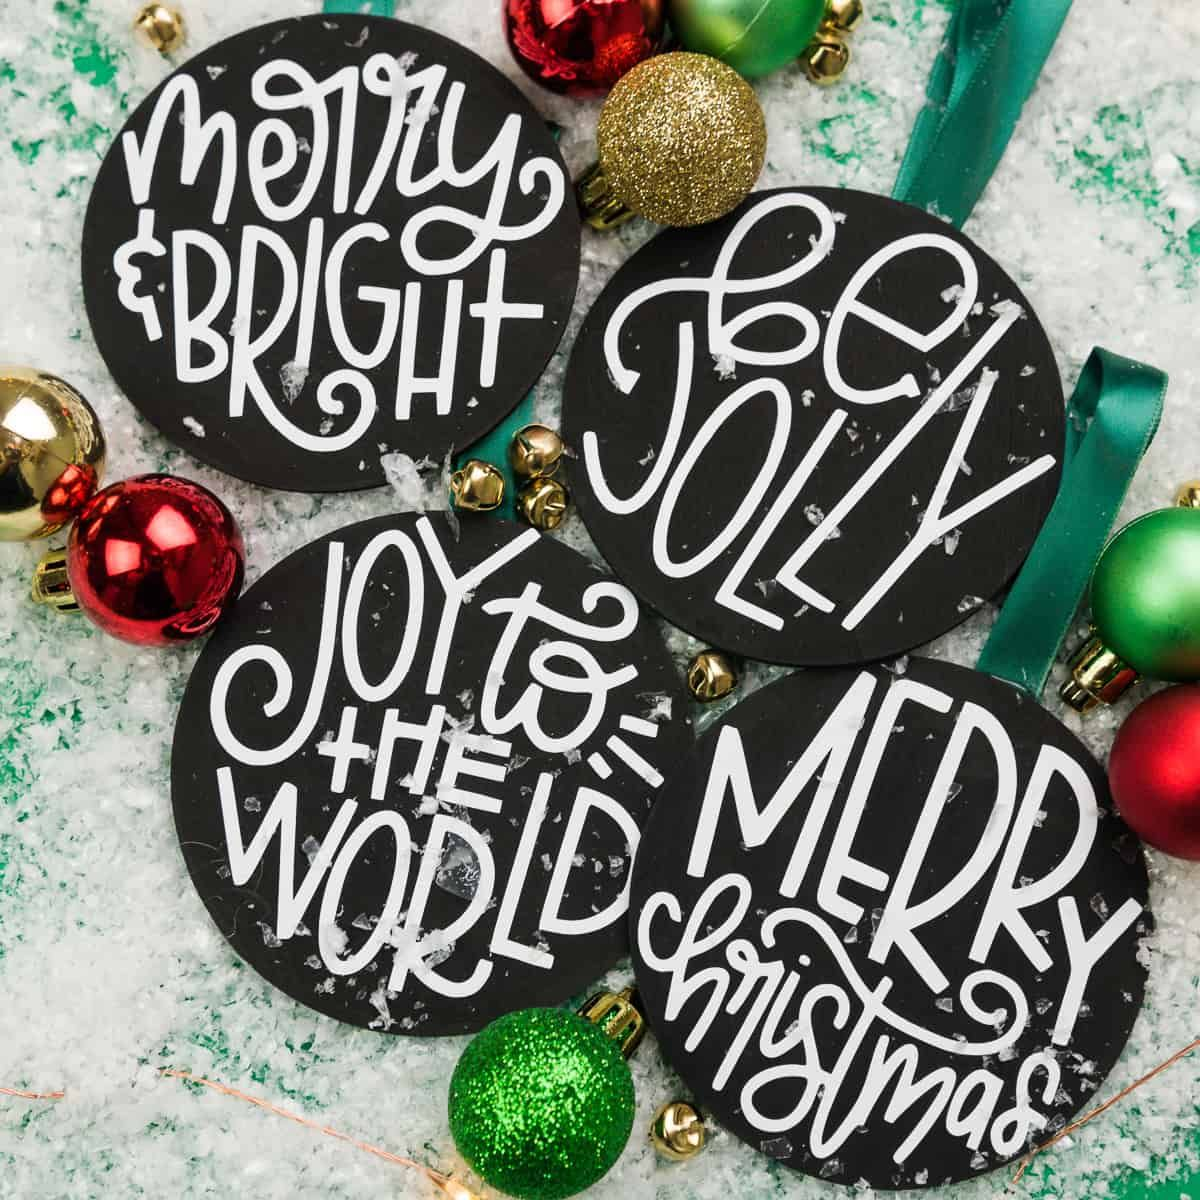 How To Put Heat Transfer Vinyl On Wood Ornaments Wood Ornaments Wooden Christmas Ornaments Wood Slice Ornament